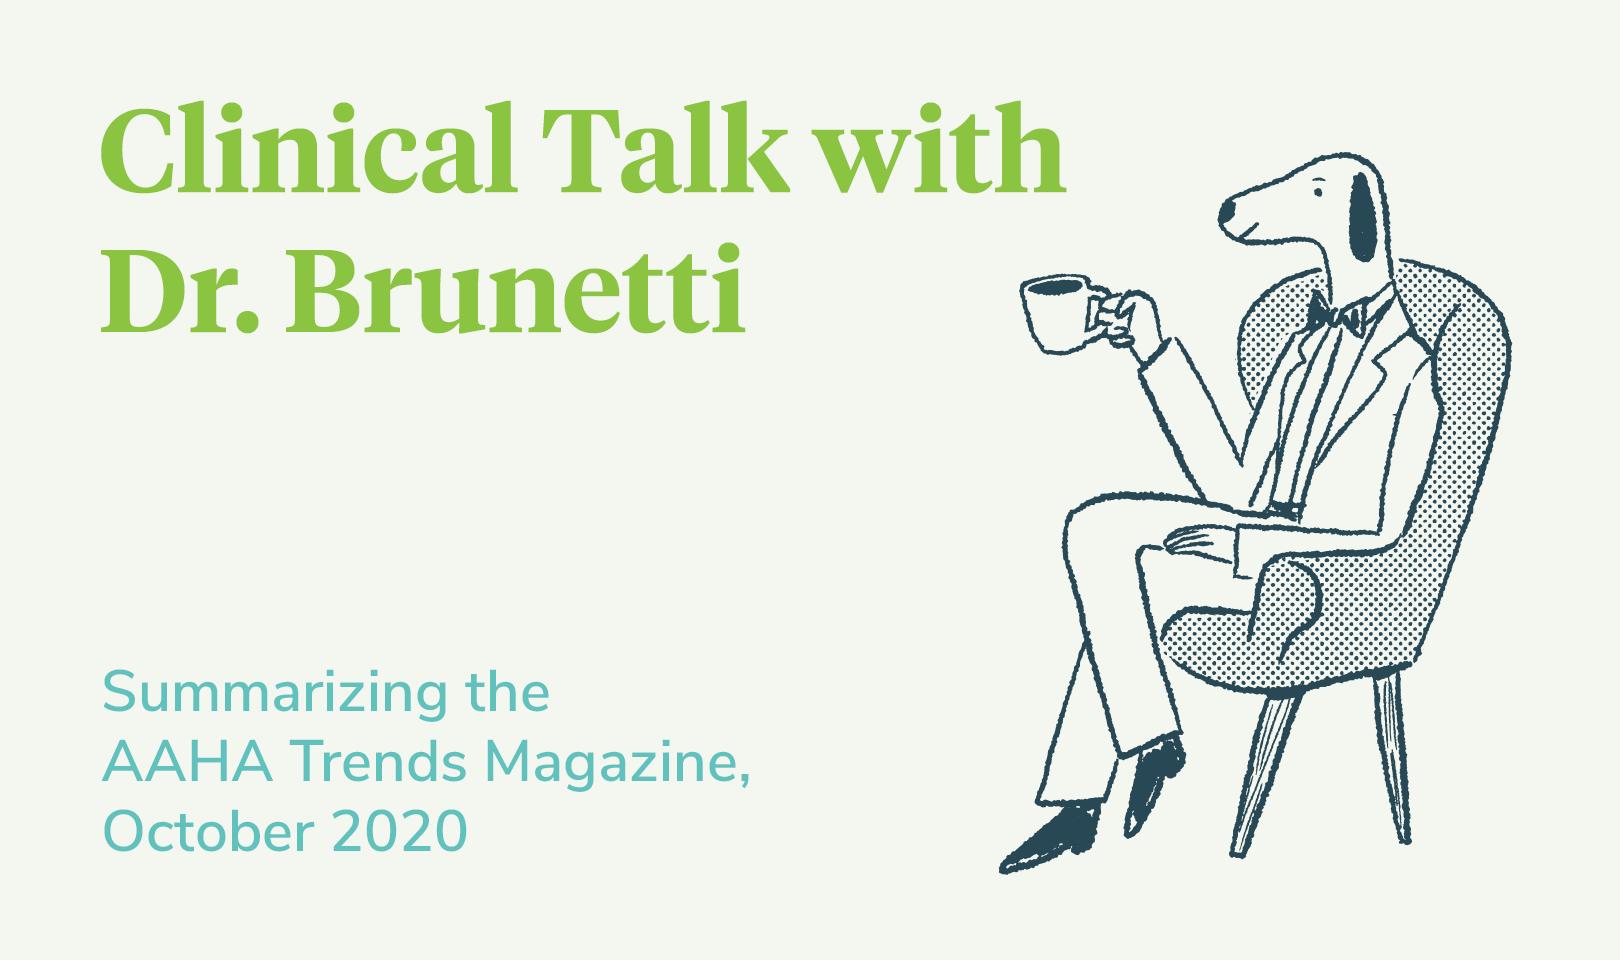 Clinical Talk - October 2020